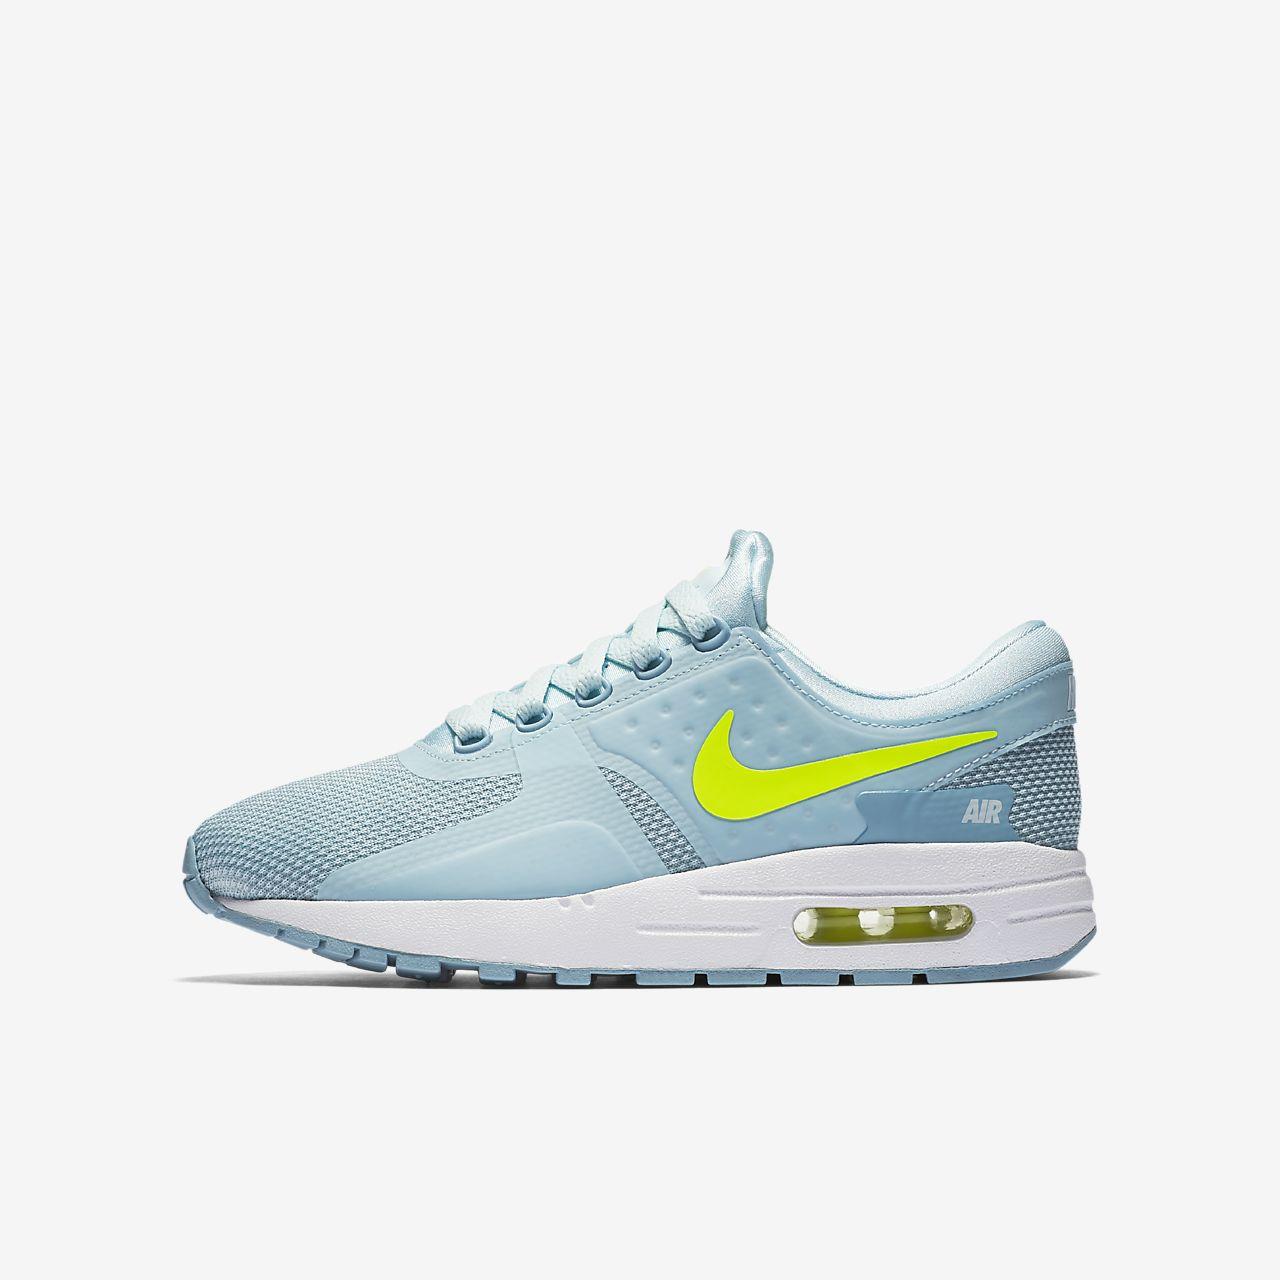 ... Scarpa Nike Air Max Zero Essential - Ragazzi